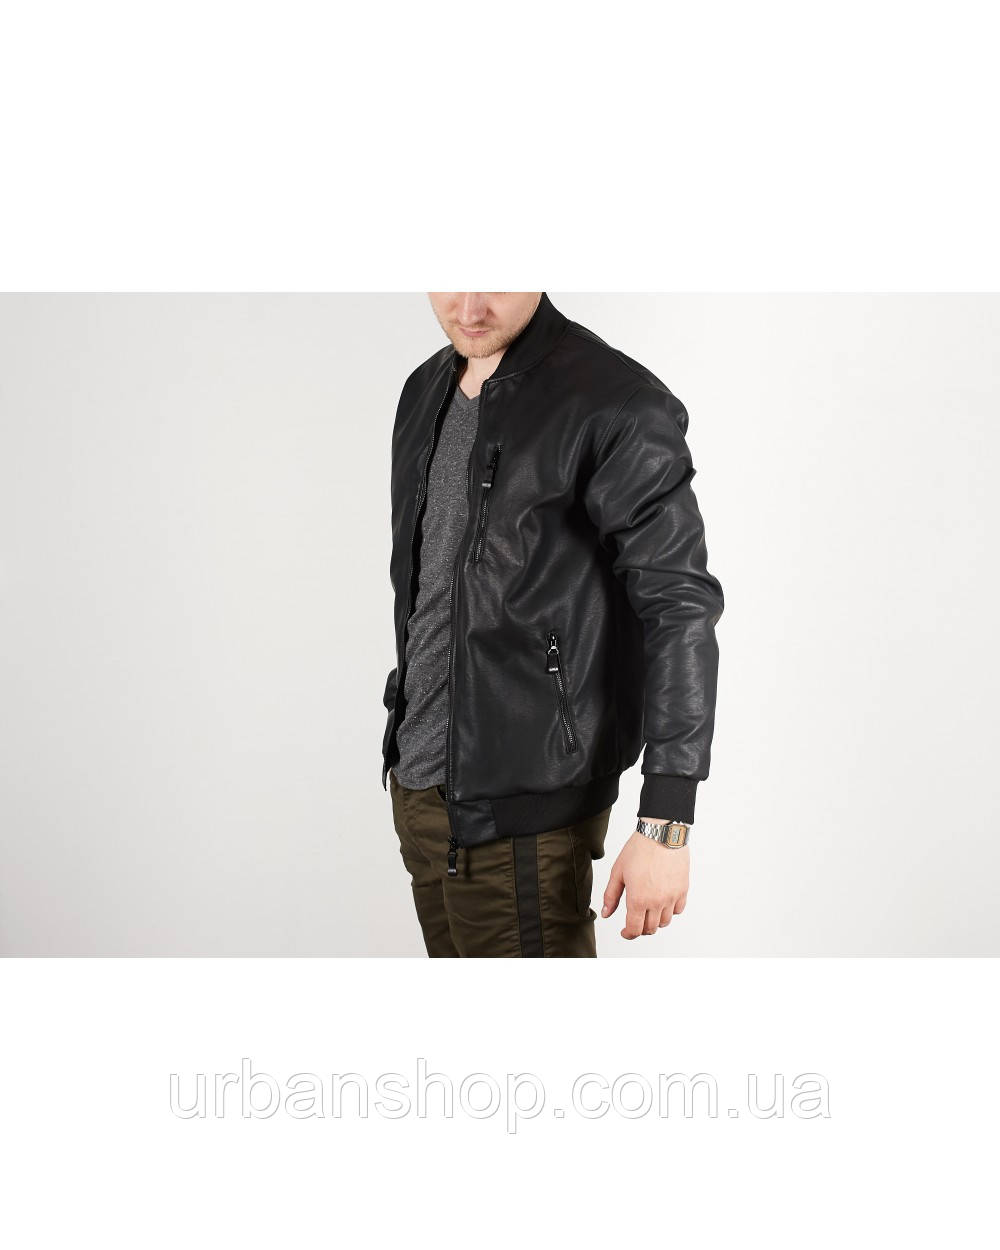 Куртка Harvest HARVEST чорного кольору \02